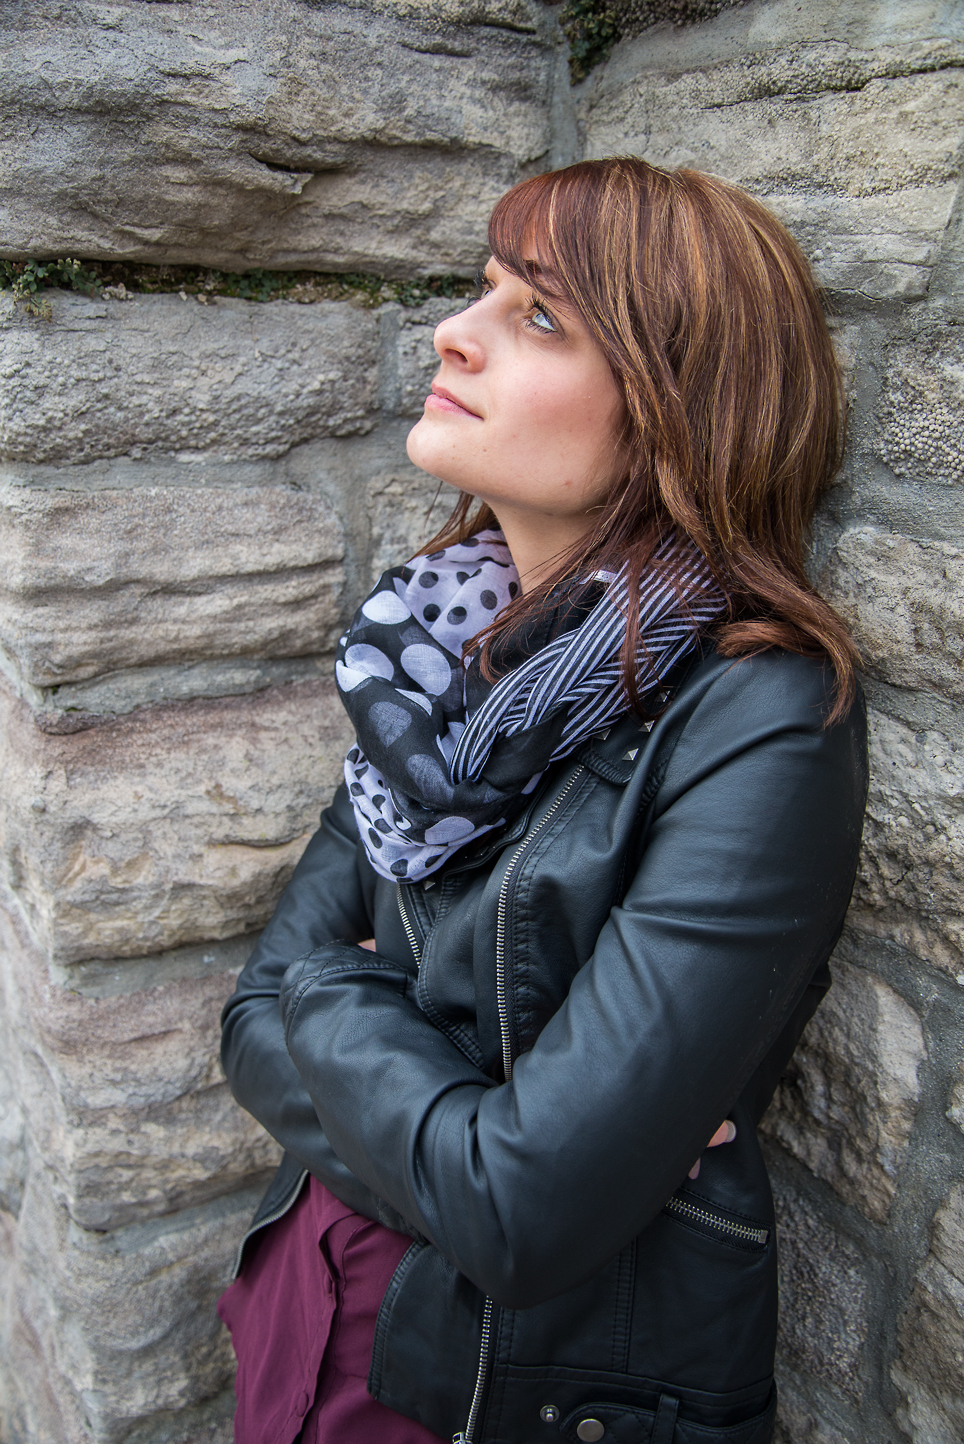 Sabrina Stöhr